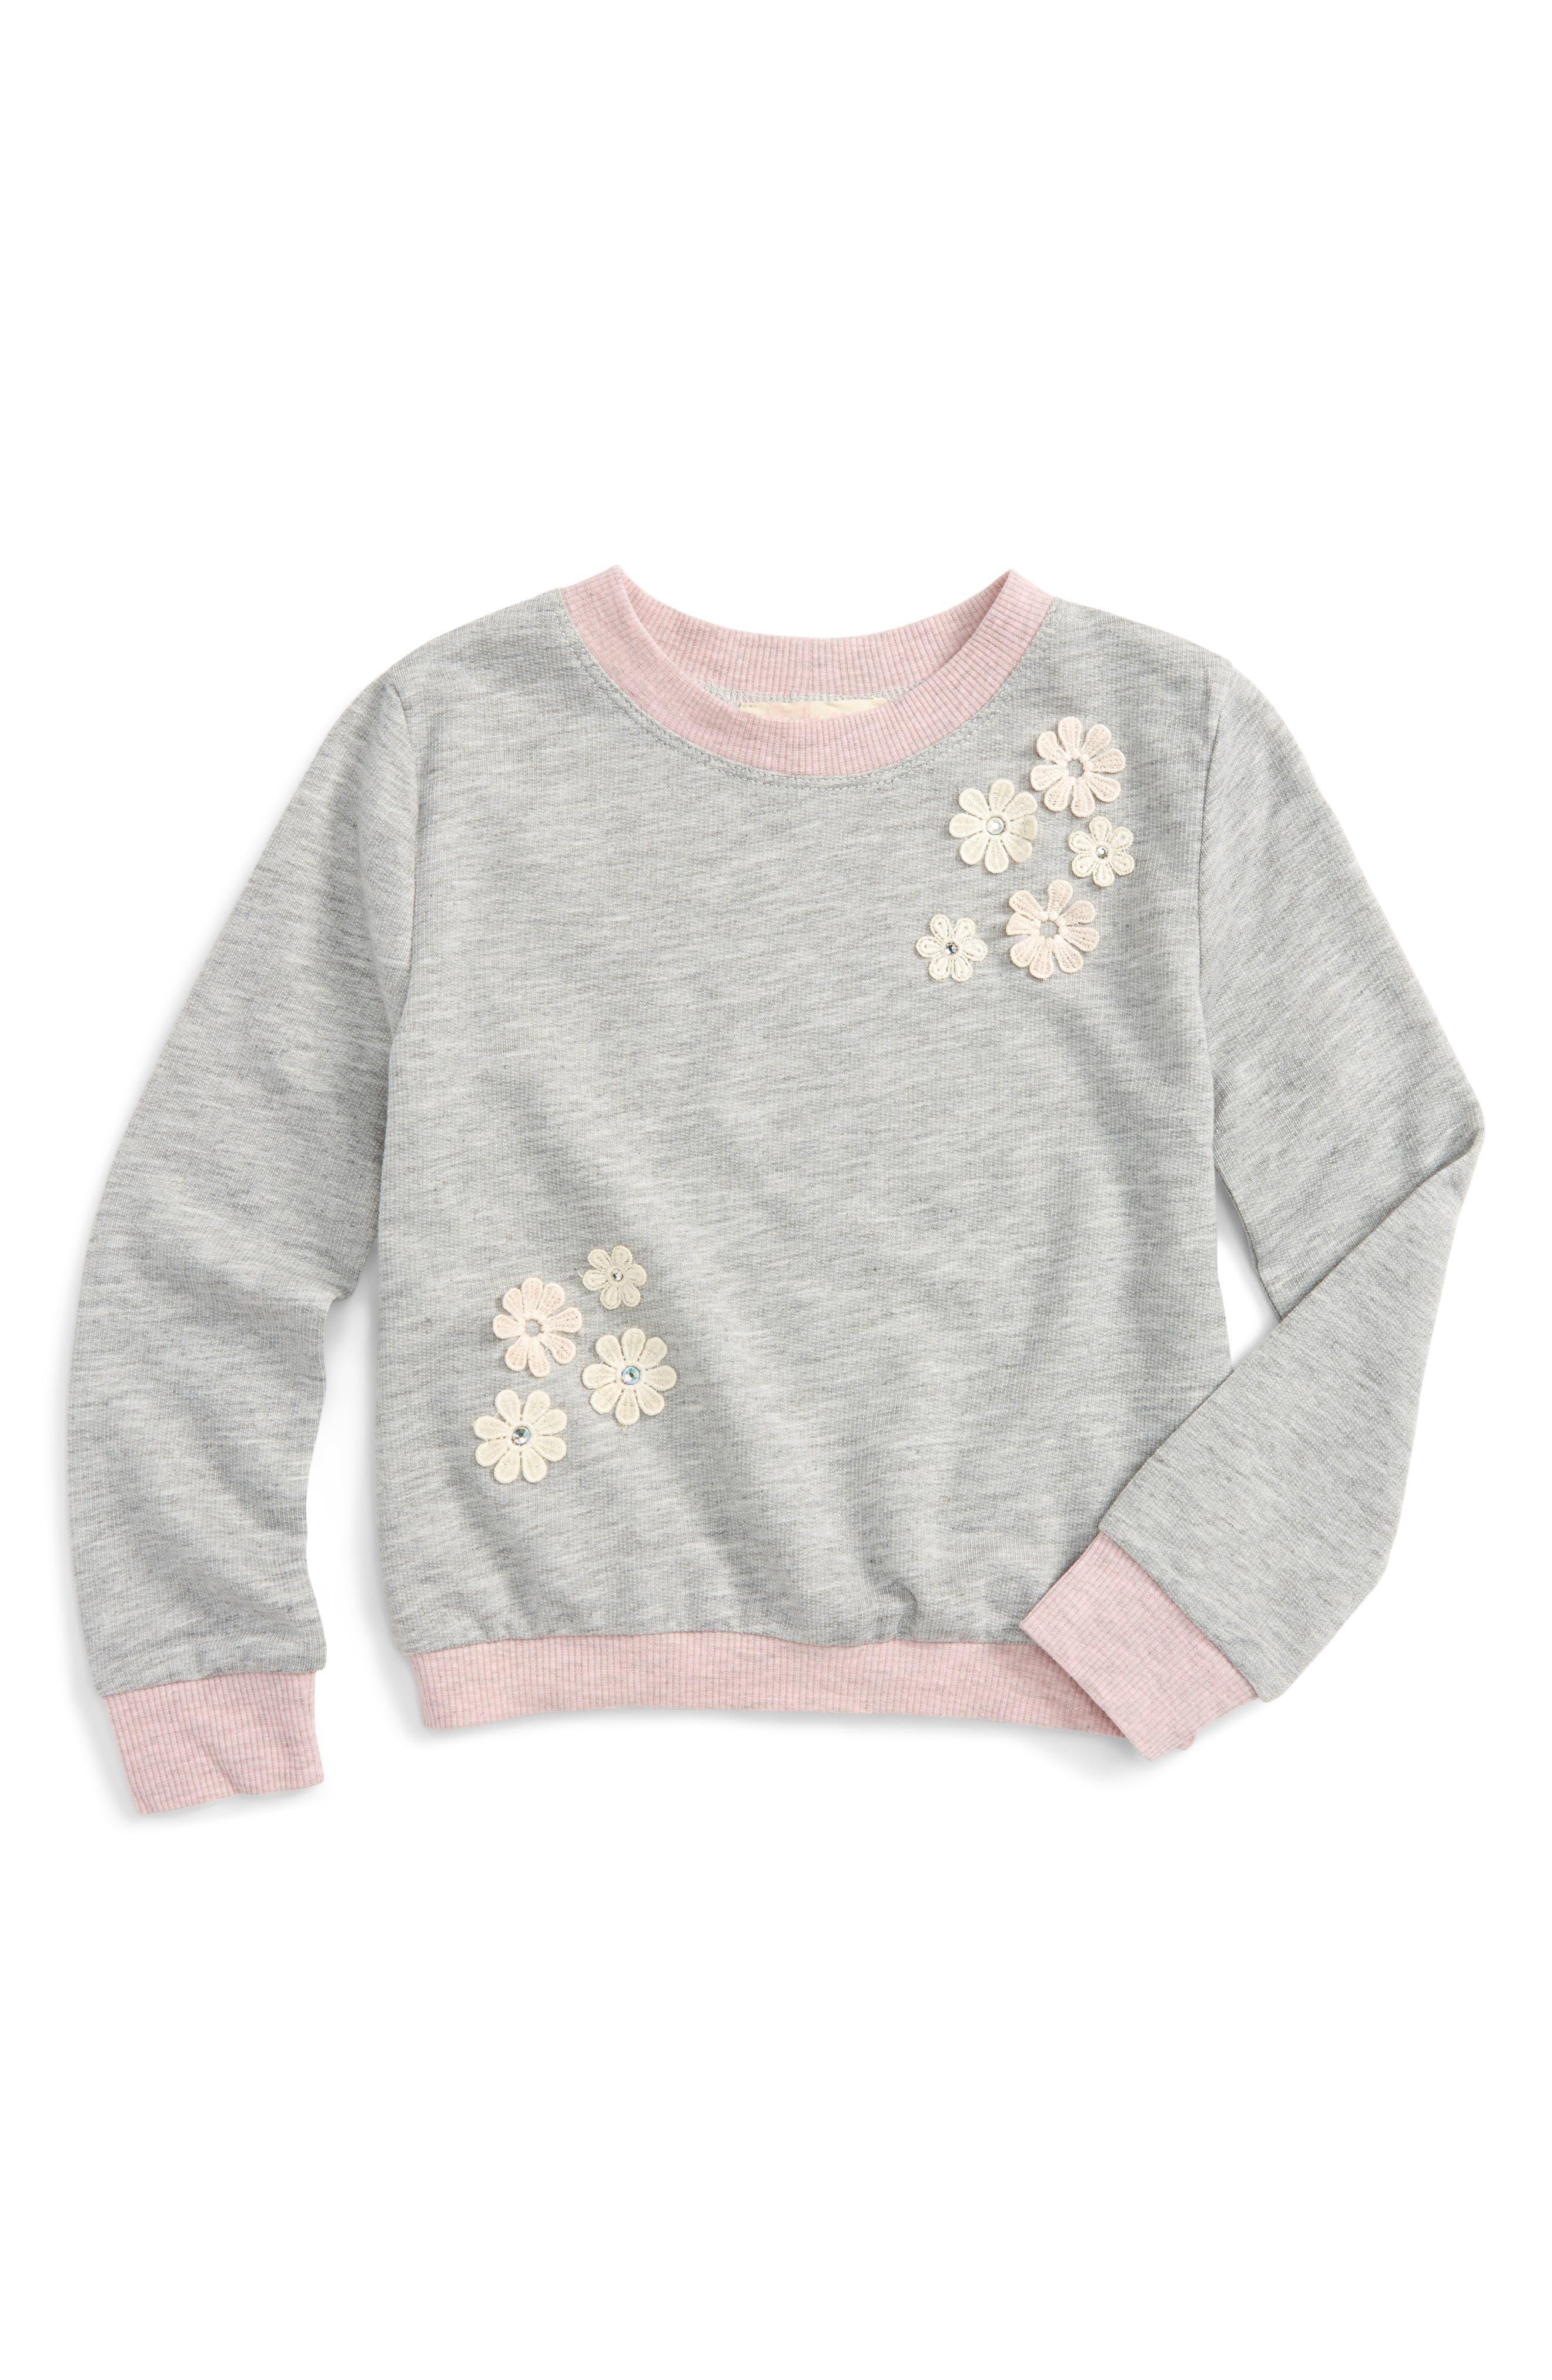 Floral Appliqué Sweatshirt,                         Main,                         color, Light Grey